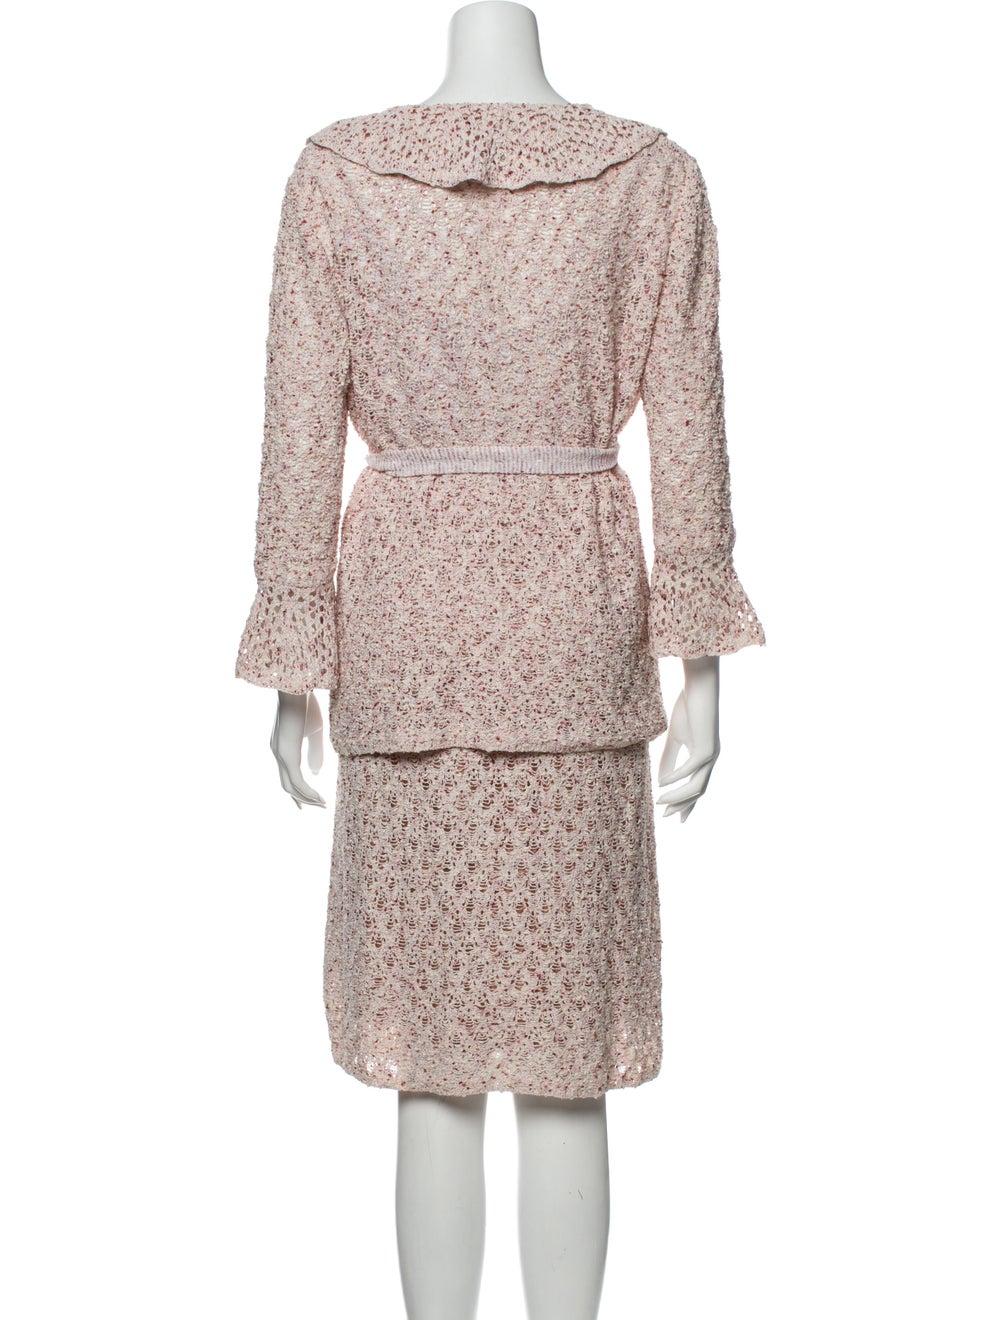 St. John Ruffle Embellishment Skirt Suit Pink - image 3